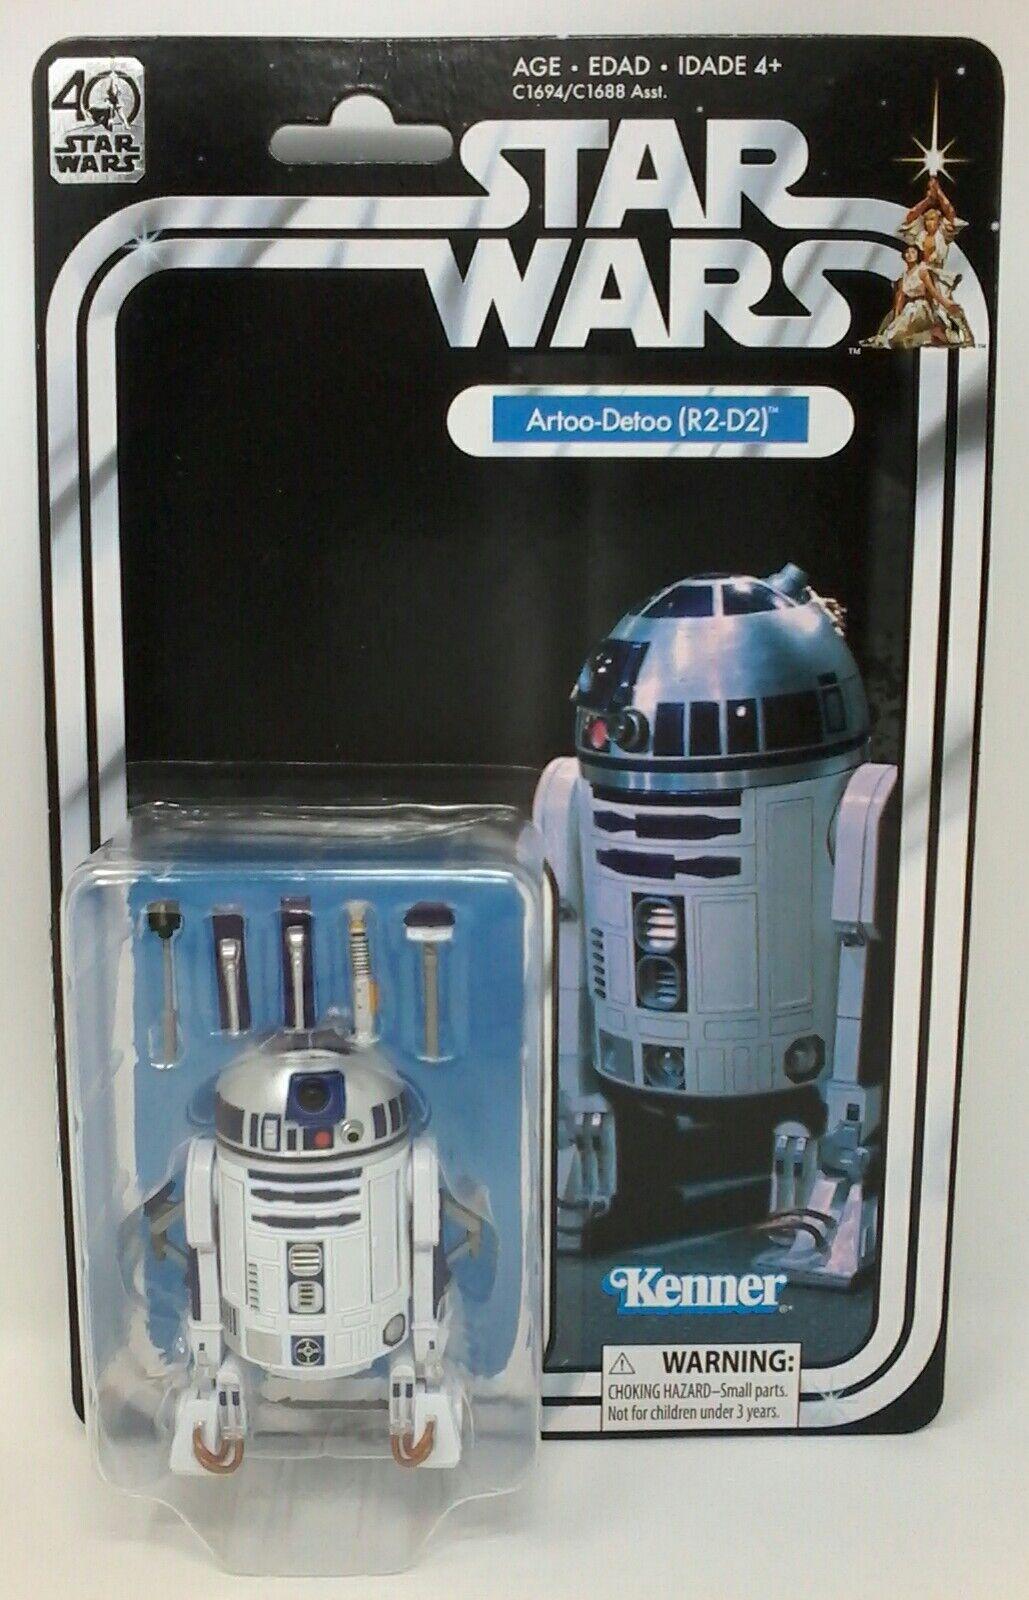 Kenner Star Wars 40th Anniversary Artoo-Detoo (R2-D2) Figure